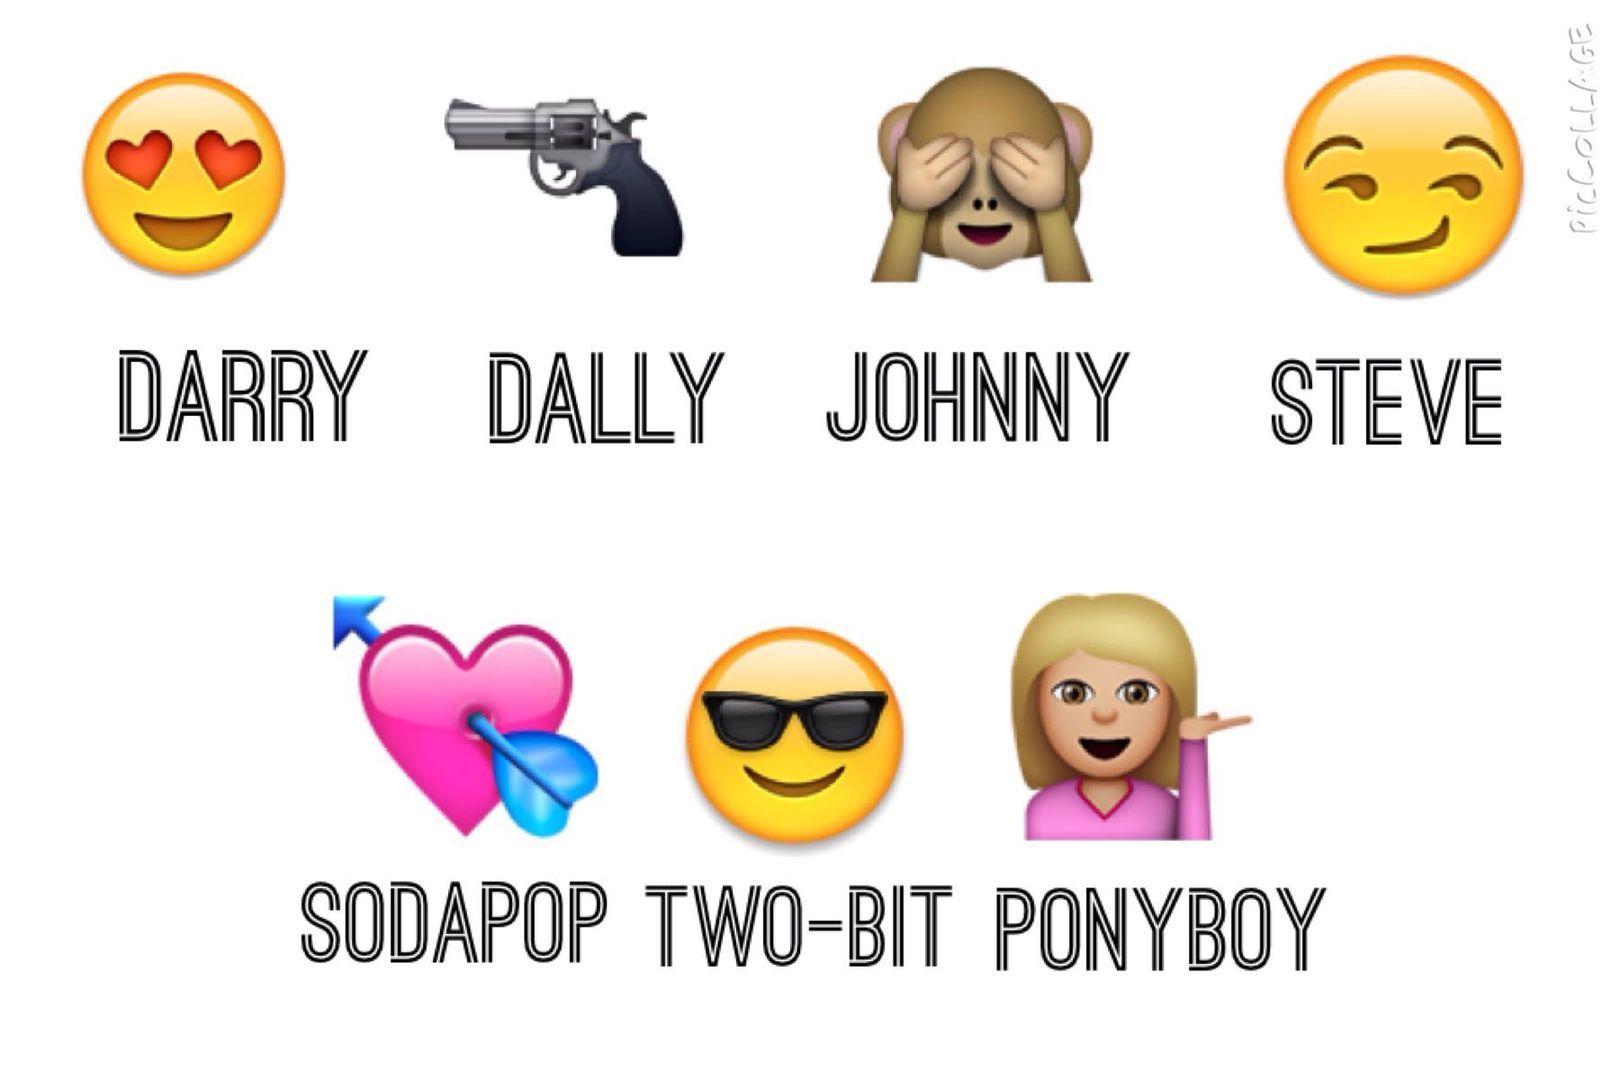 Outsider Emojis | The Outsiders | The outsiders, Darry